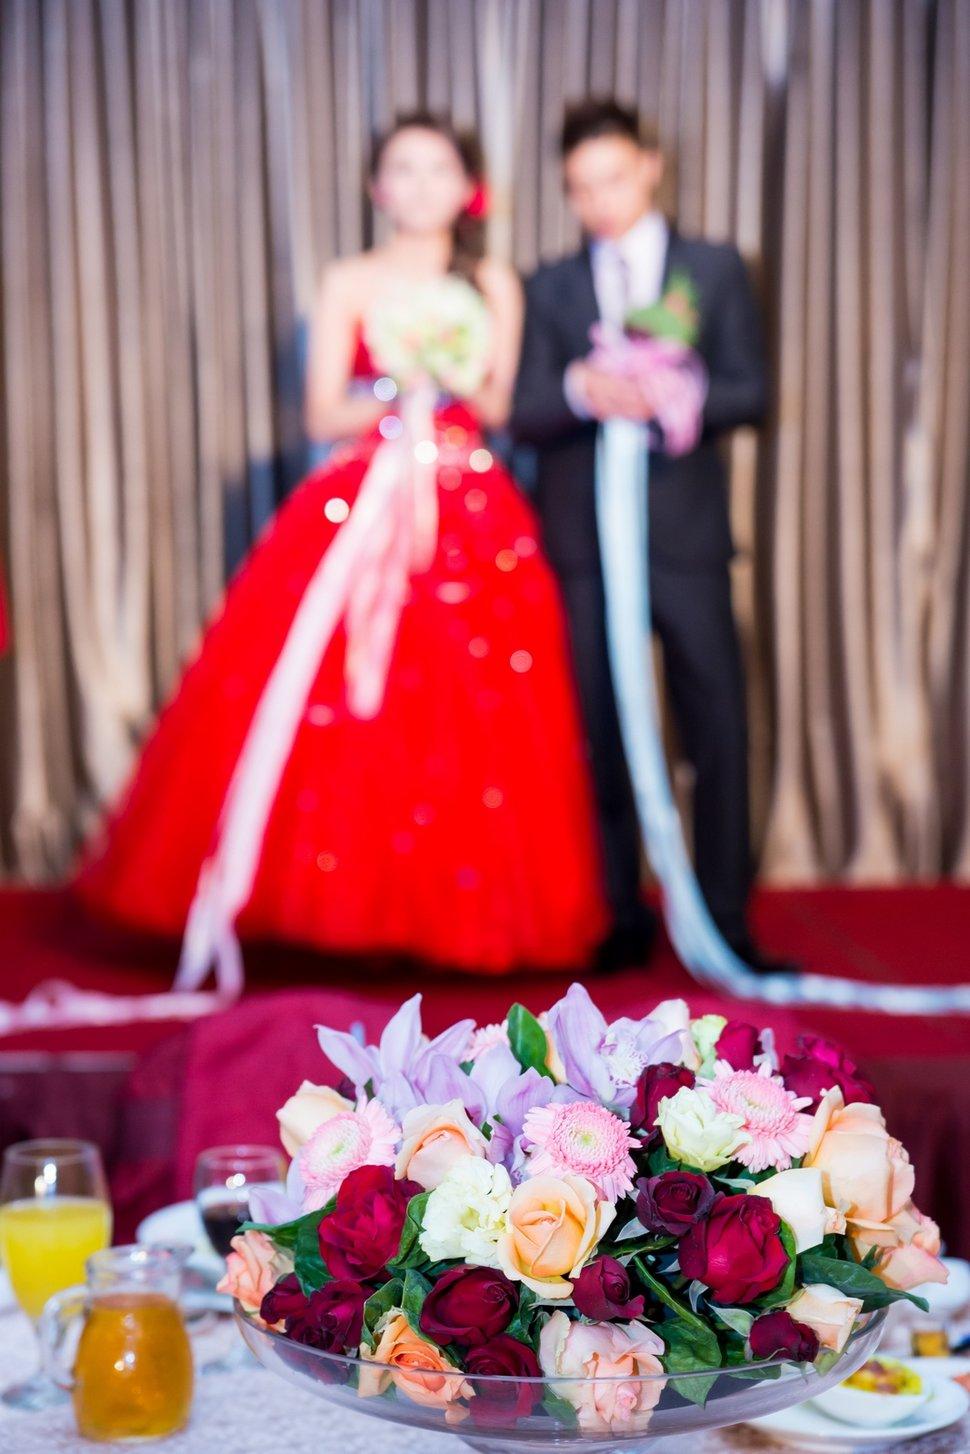 2014-01-26  0572 - Jerry  (婚攝杰瑞) - 結婚吧